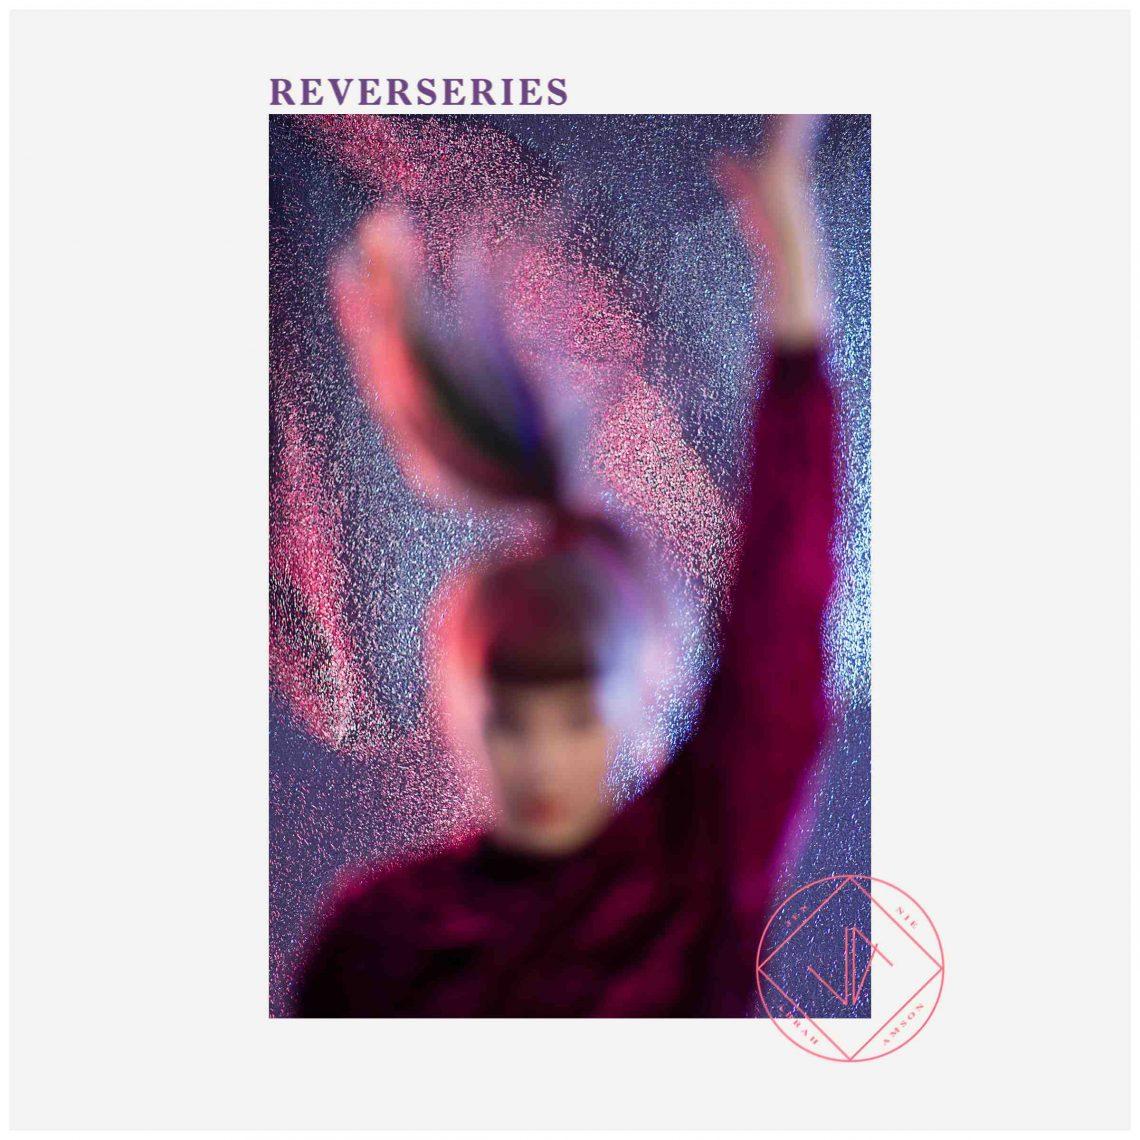 Reverseries Jennie Abrahamson album cover